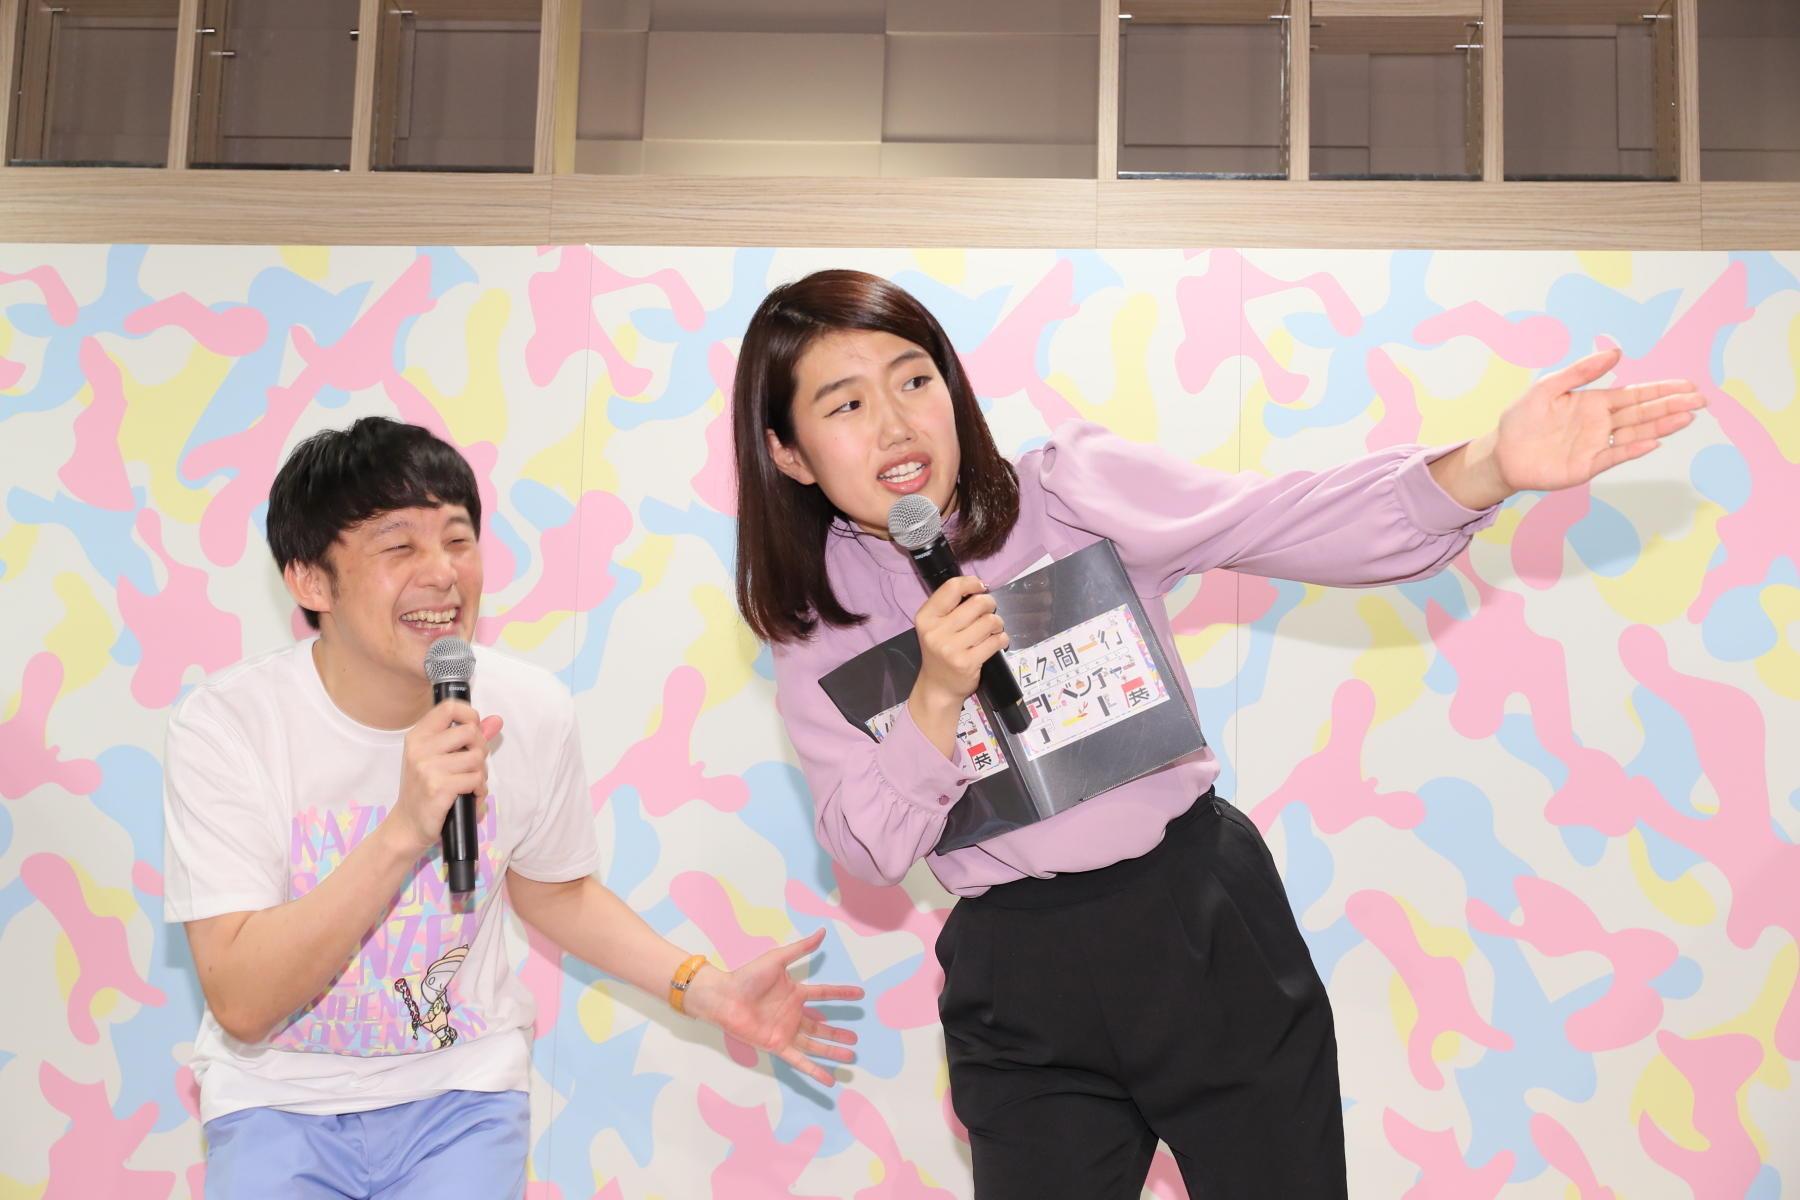 http://news.yoshimoto.co.jp/20180427001812-a376555281a058db3dc6af02d48bd63ee95d1ca0.jpg